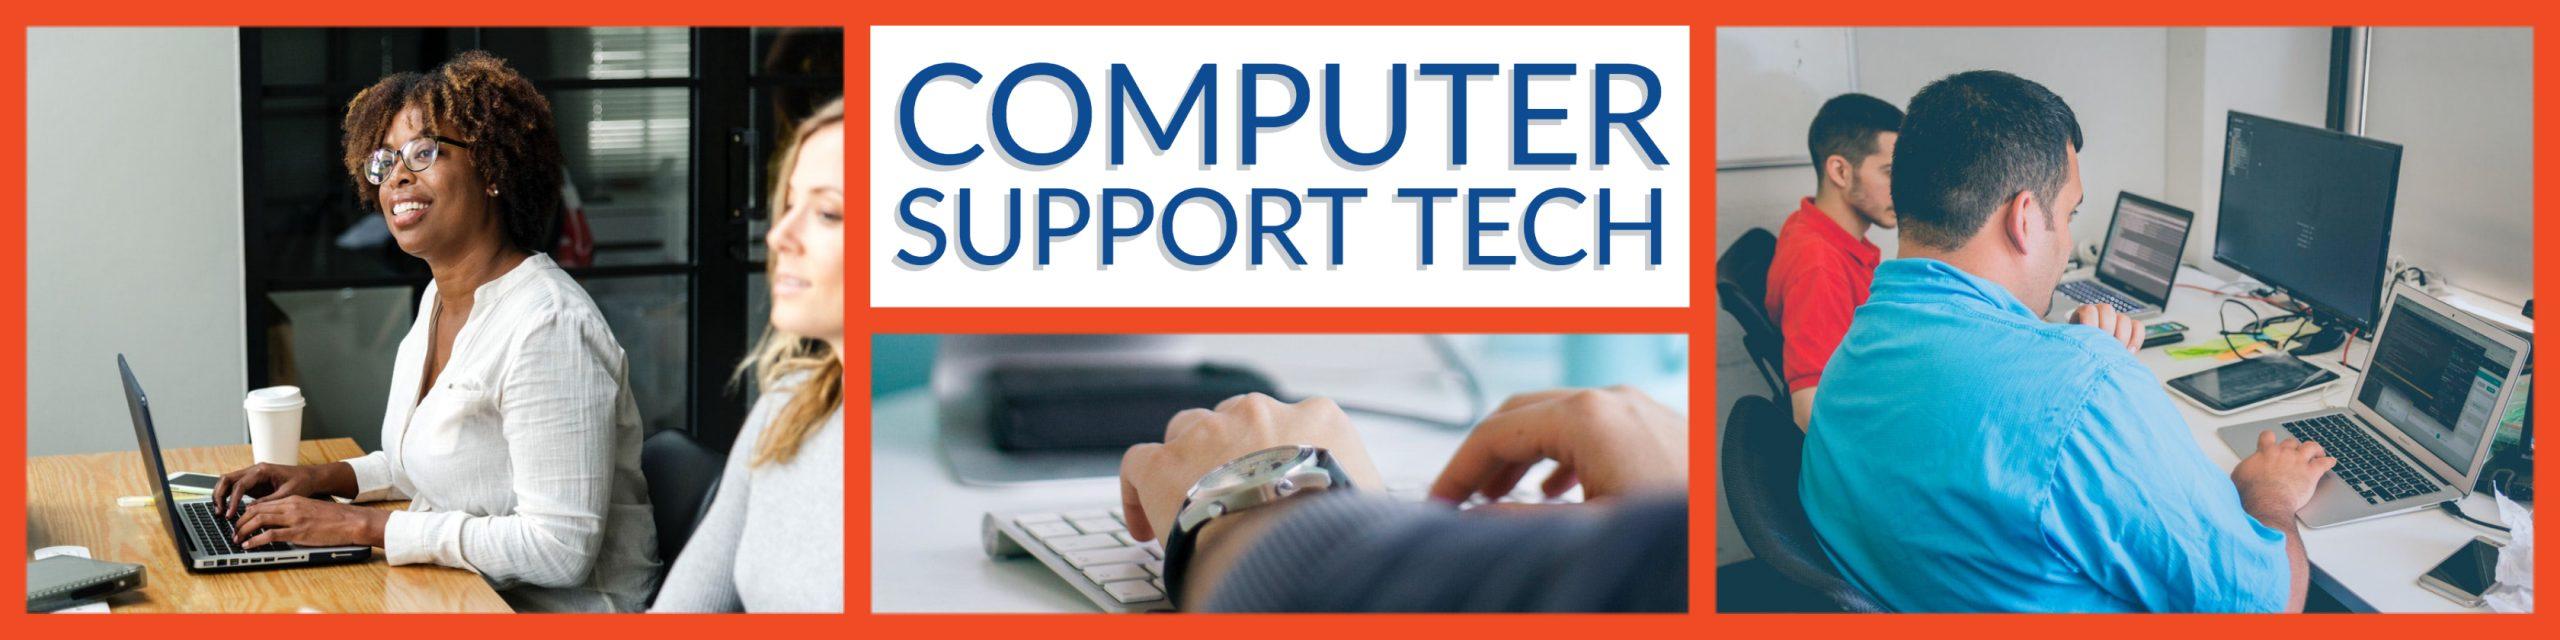 Computer Desktop Support Technician at Galveston College